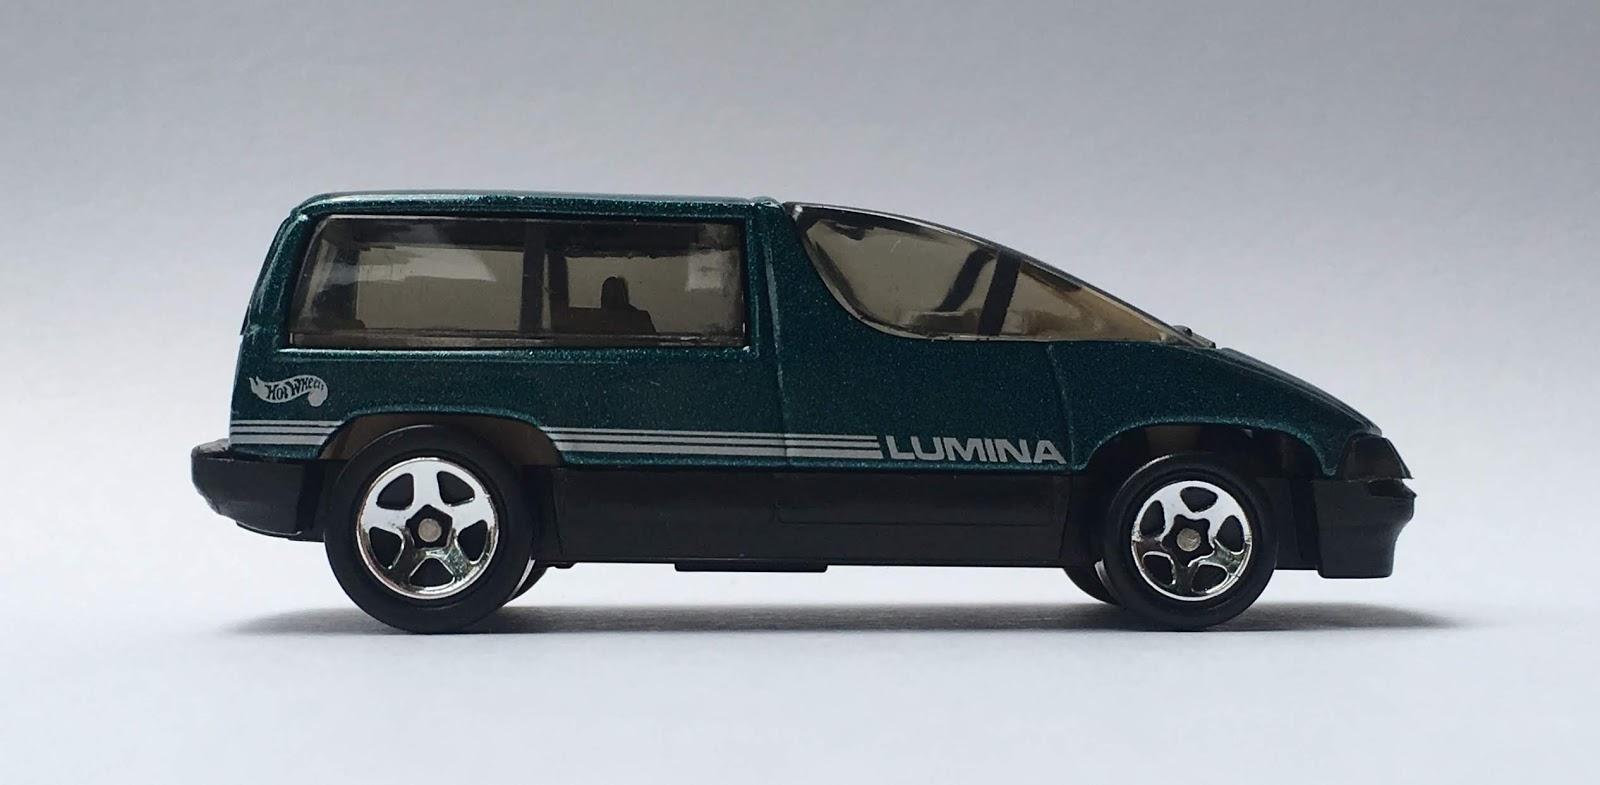 hot wheels chevy lumina [ 1600 x 785 Pixel ]